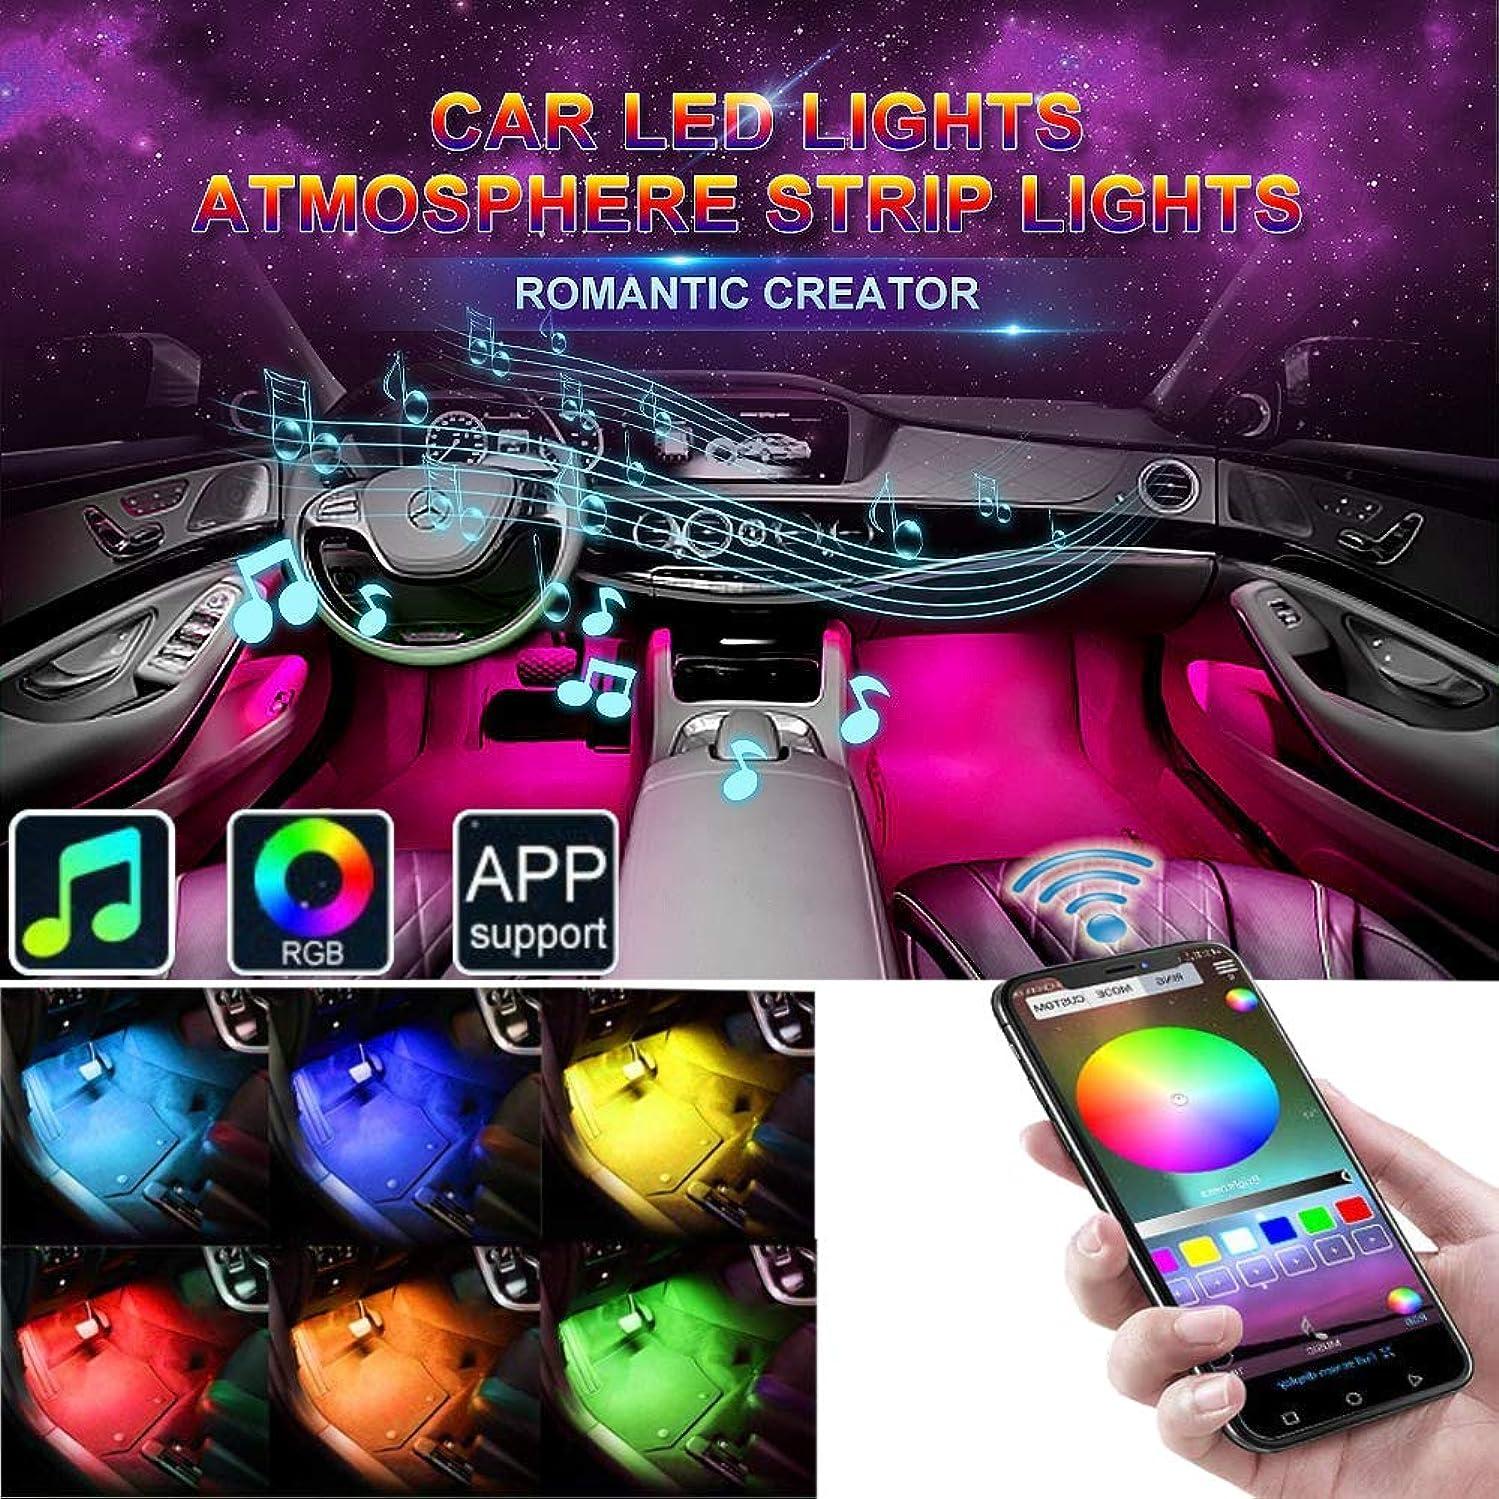 Car LED Strip Lights,EJ's SUPER CAR 4pcs 48 LED Bluetooth App Controller Interior Lights Multi Color Music Car Strip Light Under Dash Lighting Kit,Sound Active Function for iPhone Android Smart Phone